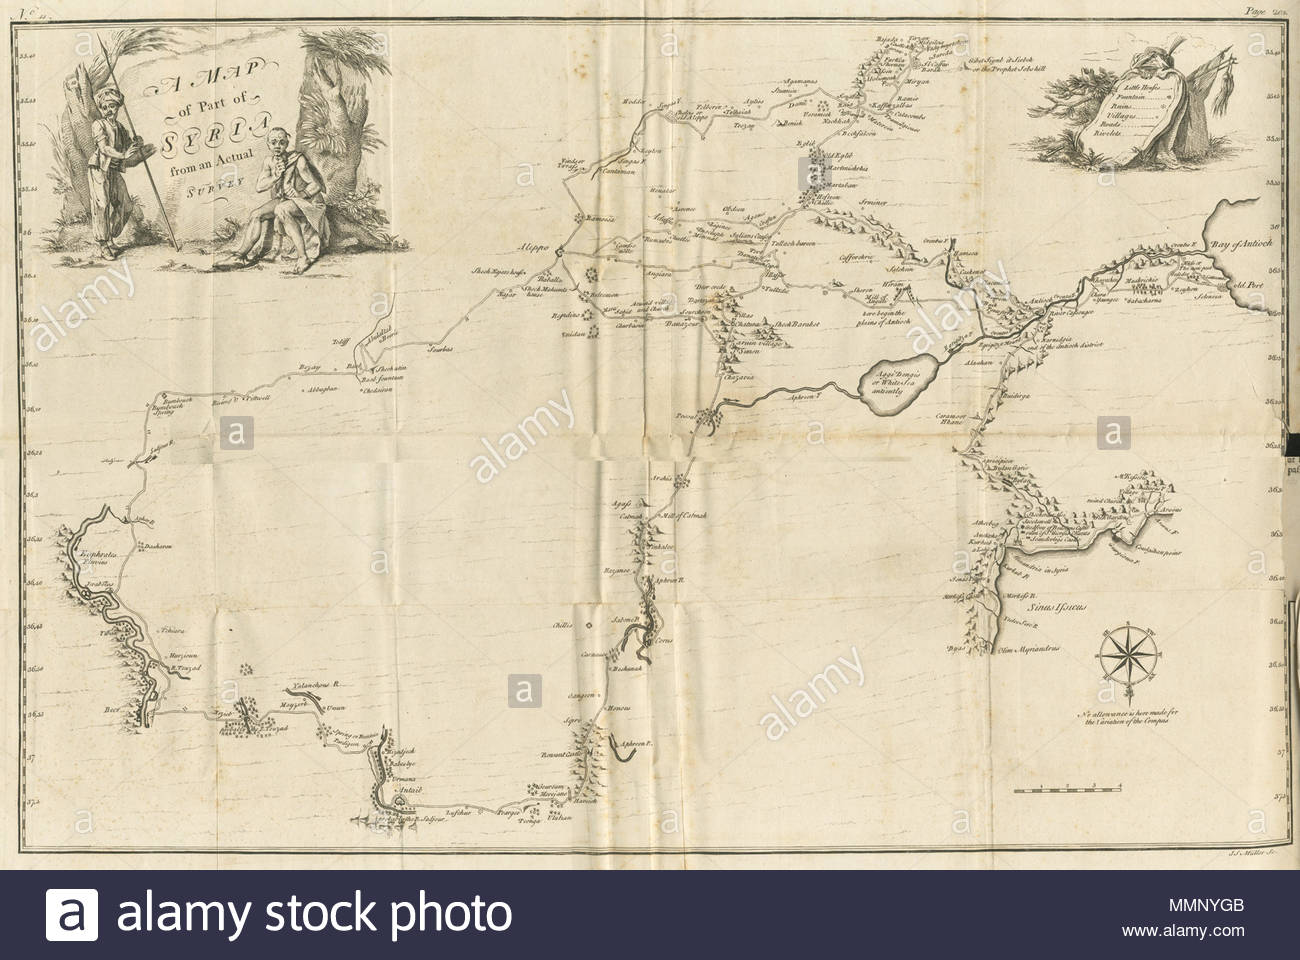 English Alexander Drummond Travels through different Cities